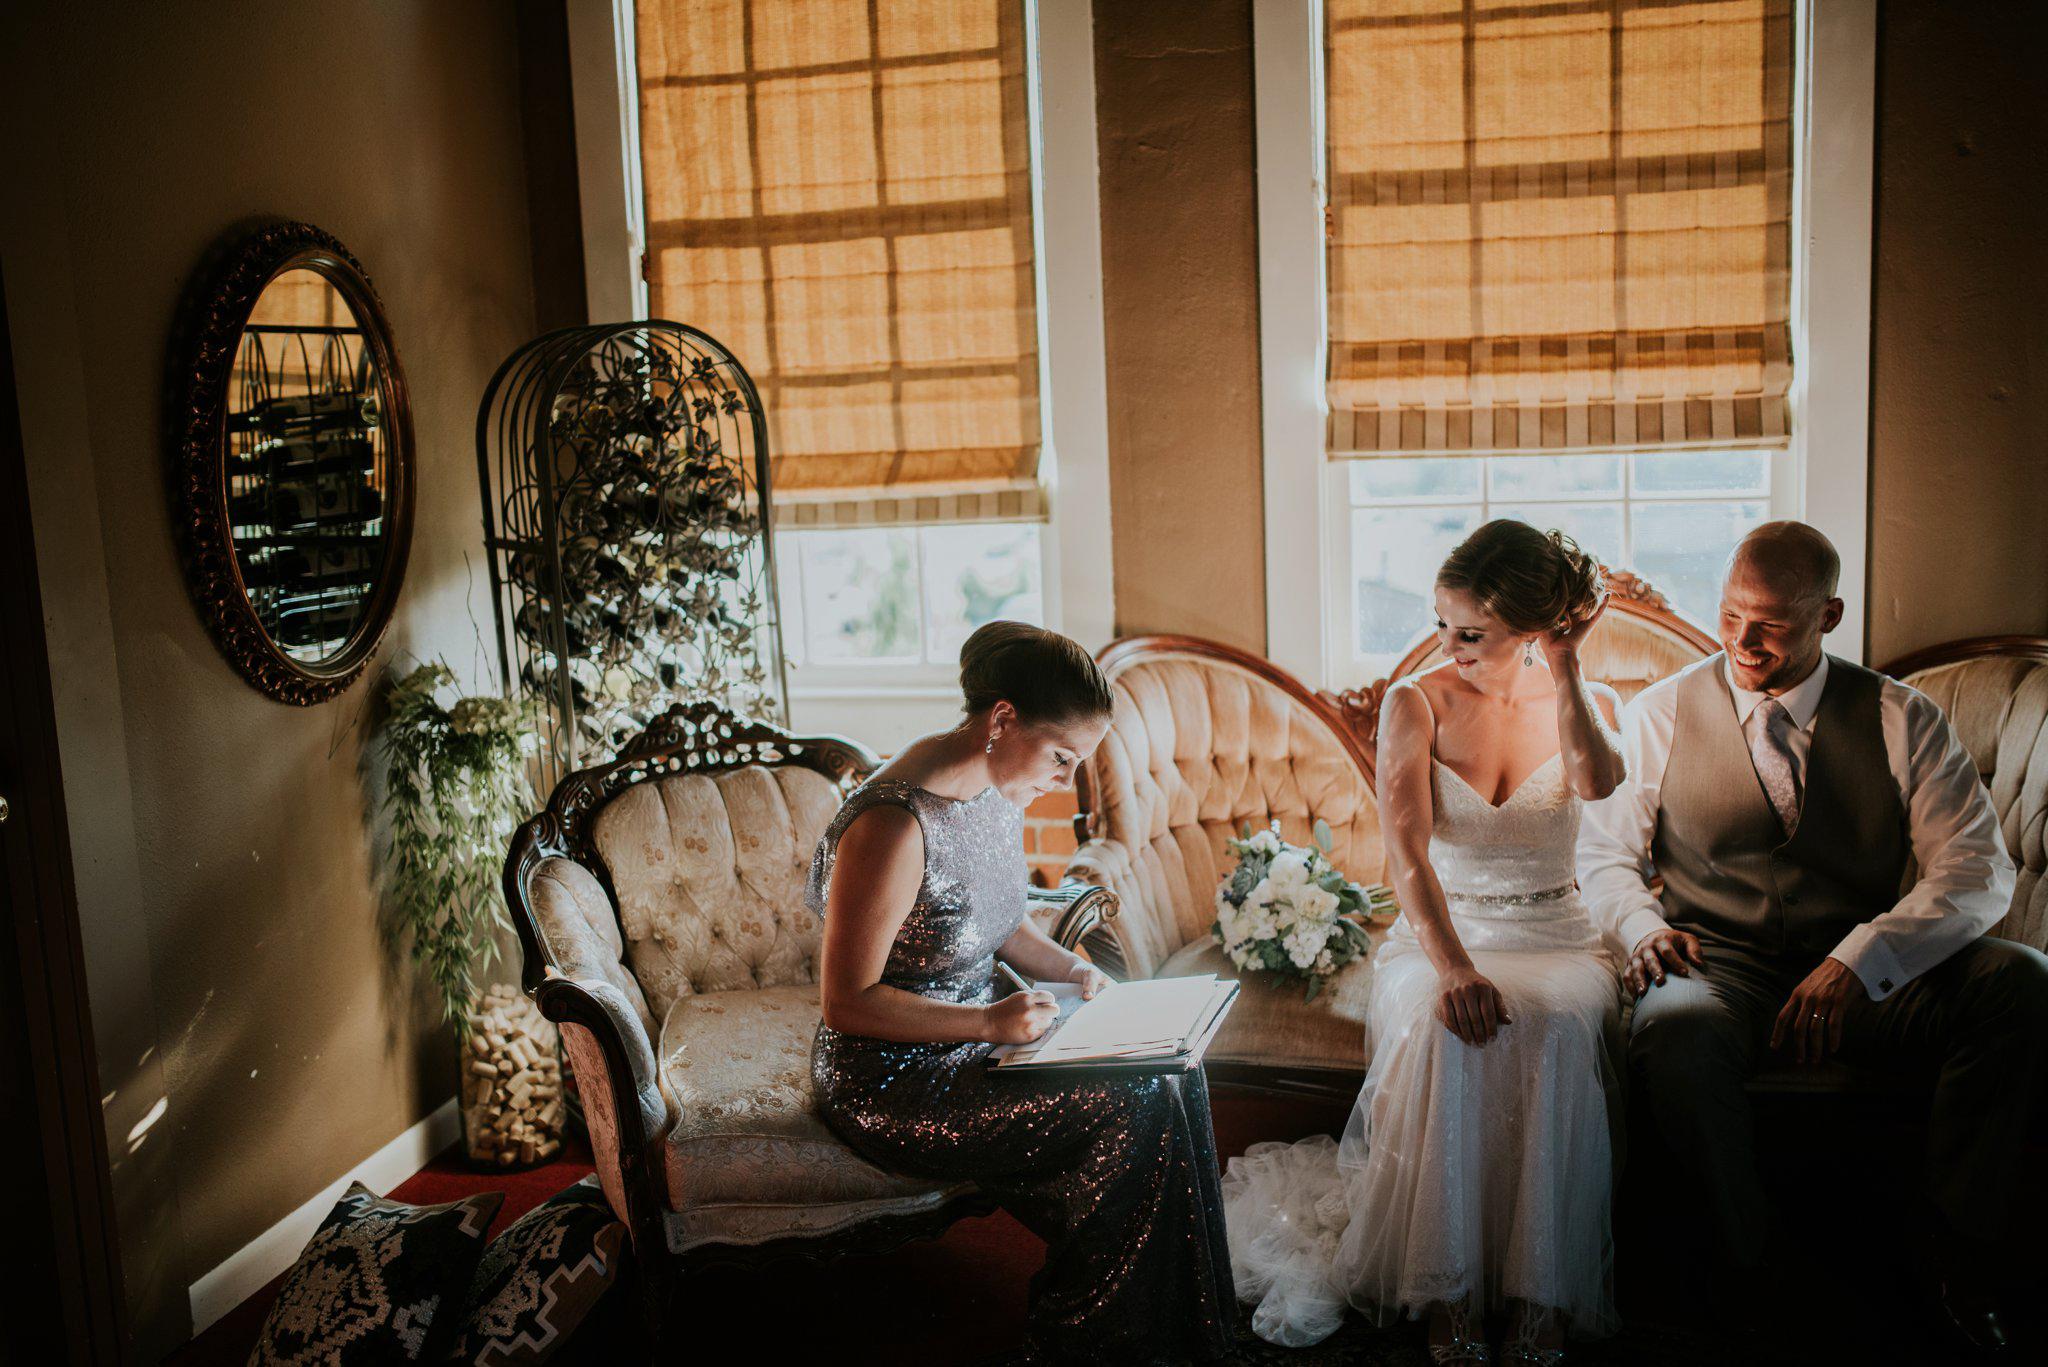 hollywood-school-house-wedding-seattle-photographer-caitlyn-nikula-84.jpg